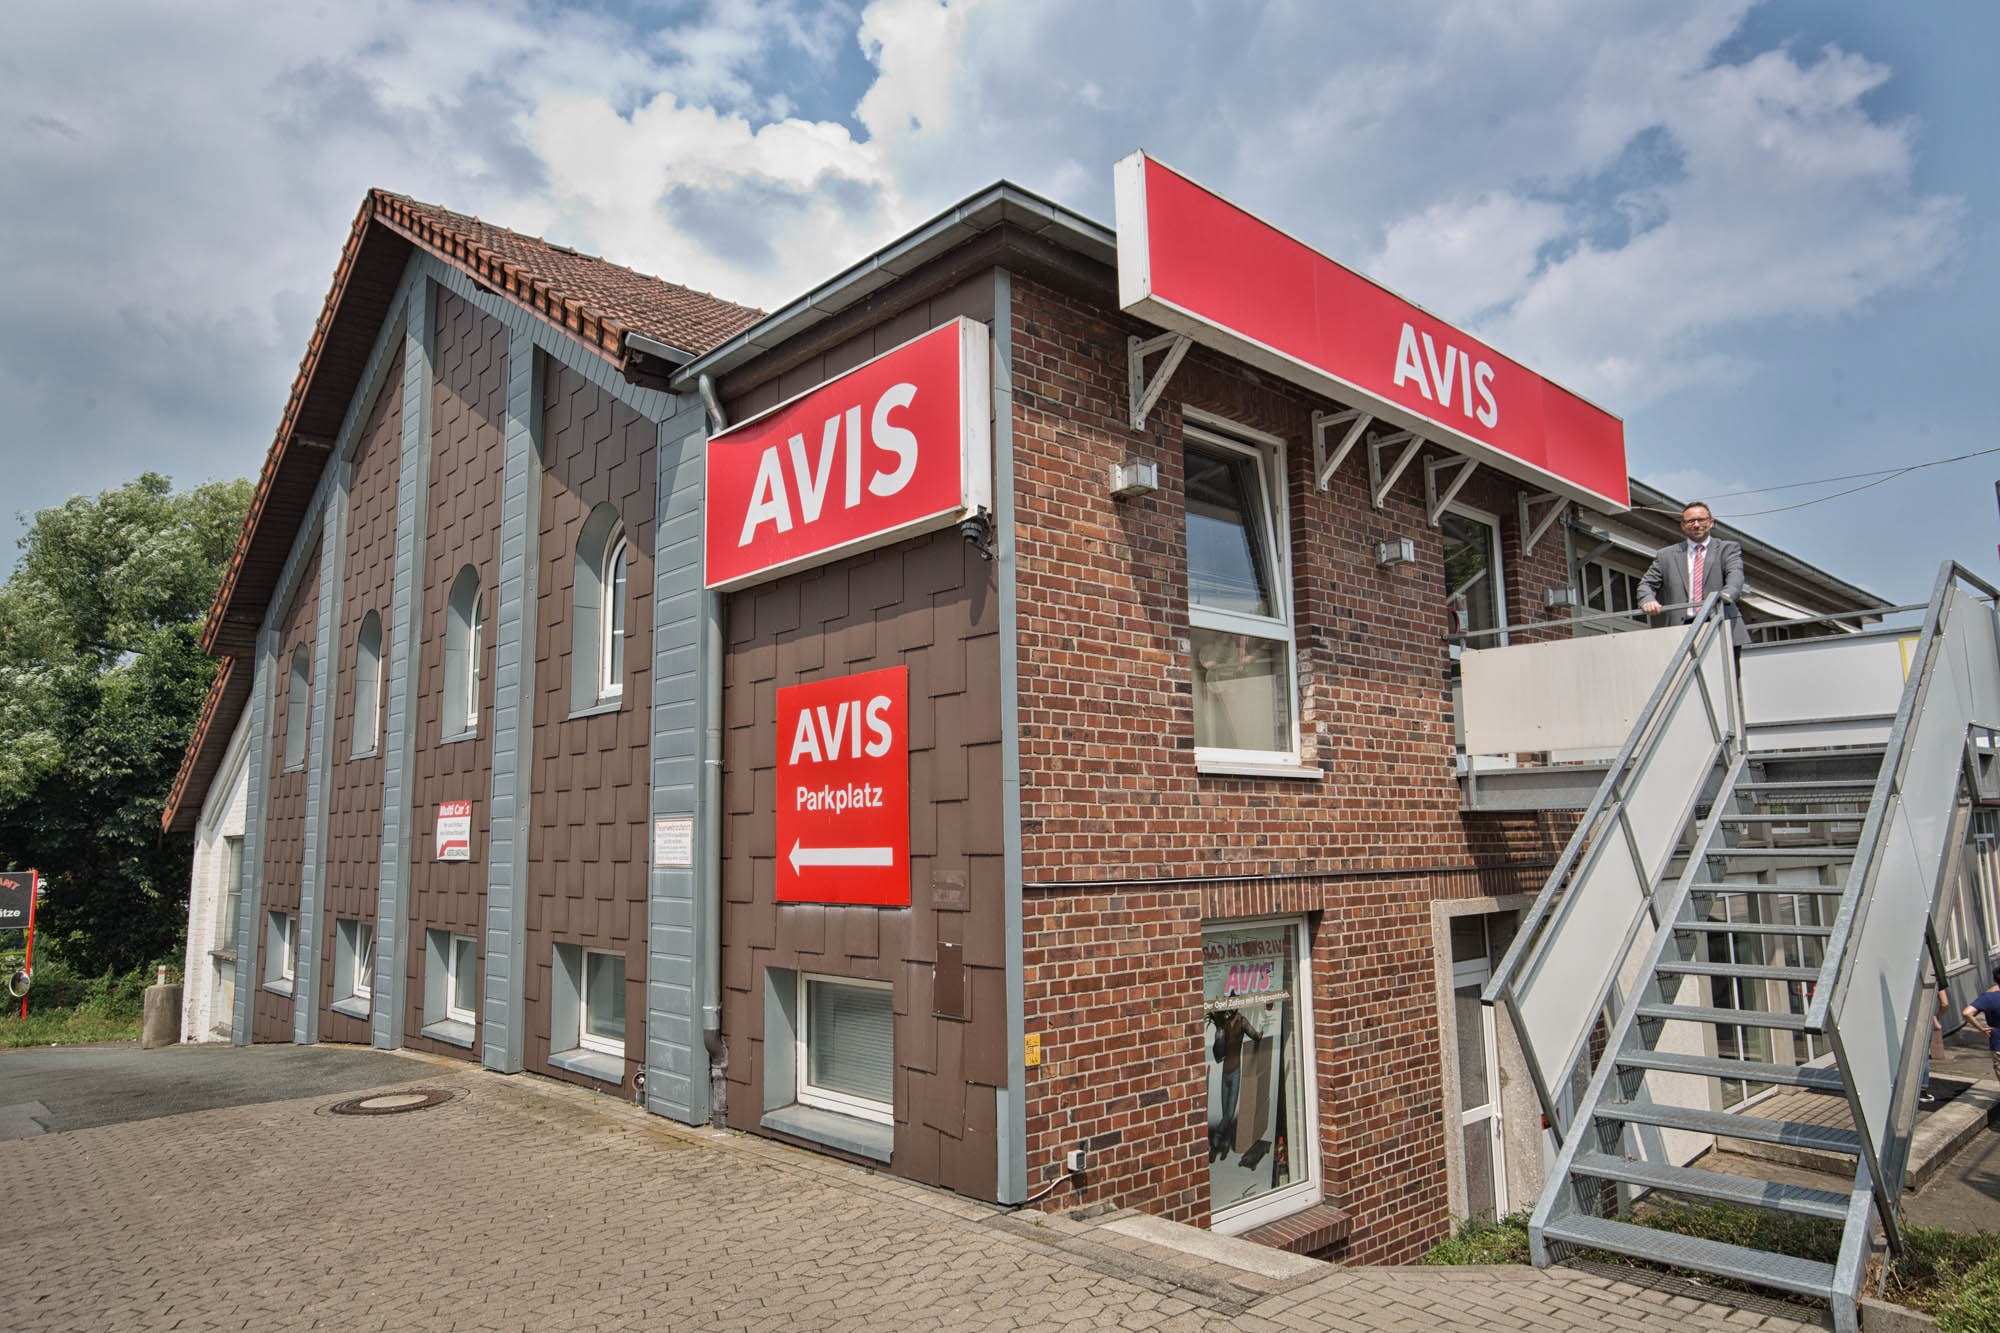 AVIS Ziemann in Bad Oyenhausen